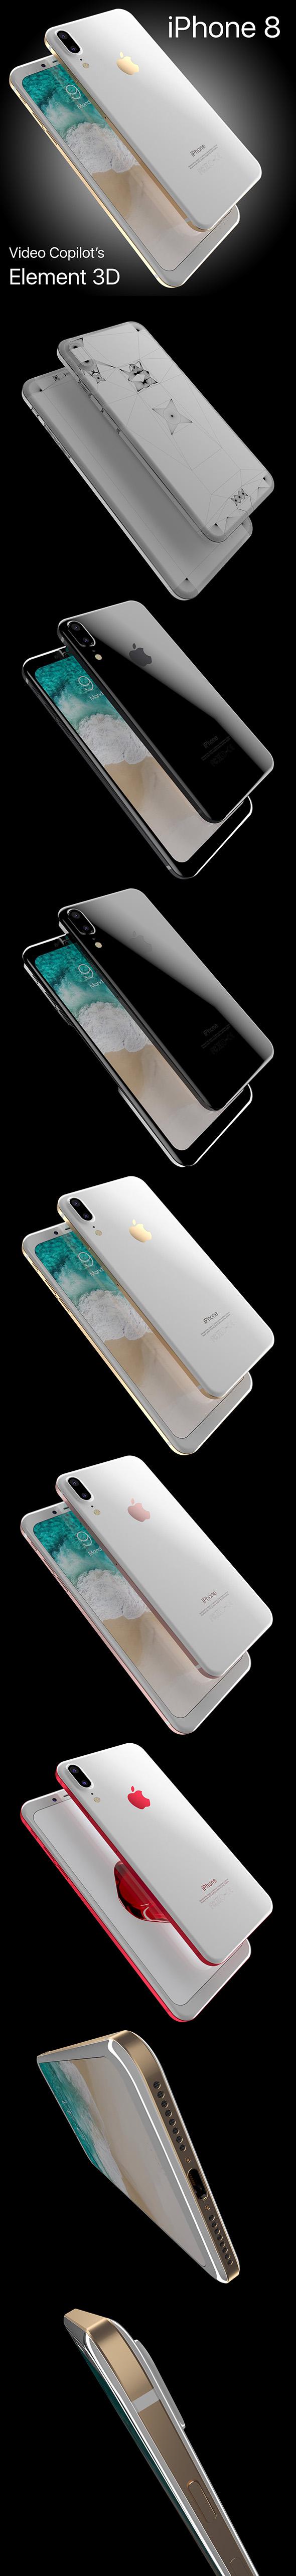 3DOcean Apple iPhone 8 X Concept Leak Corner edges All Colors 20133535